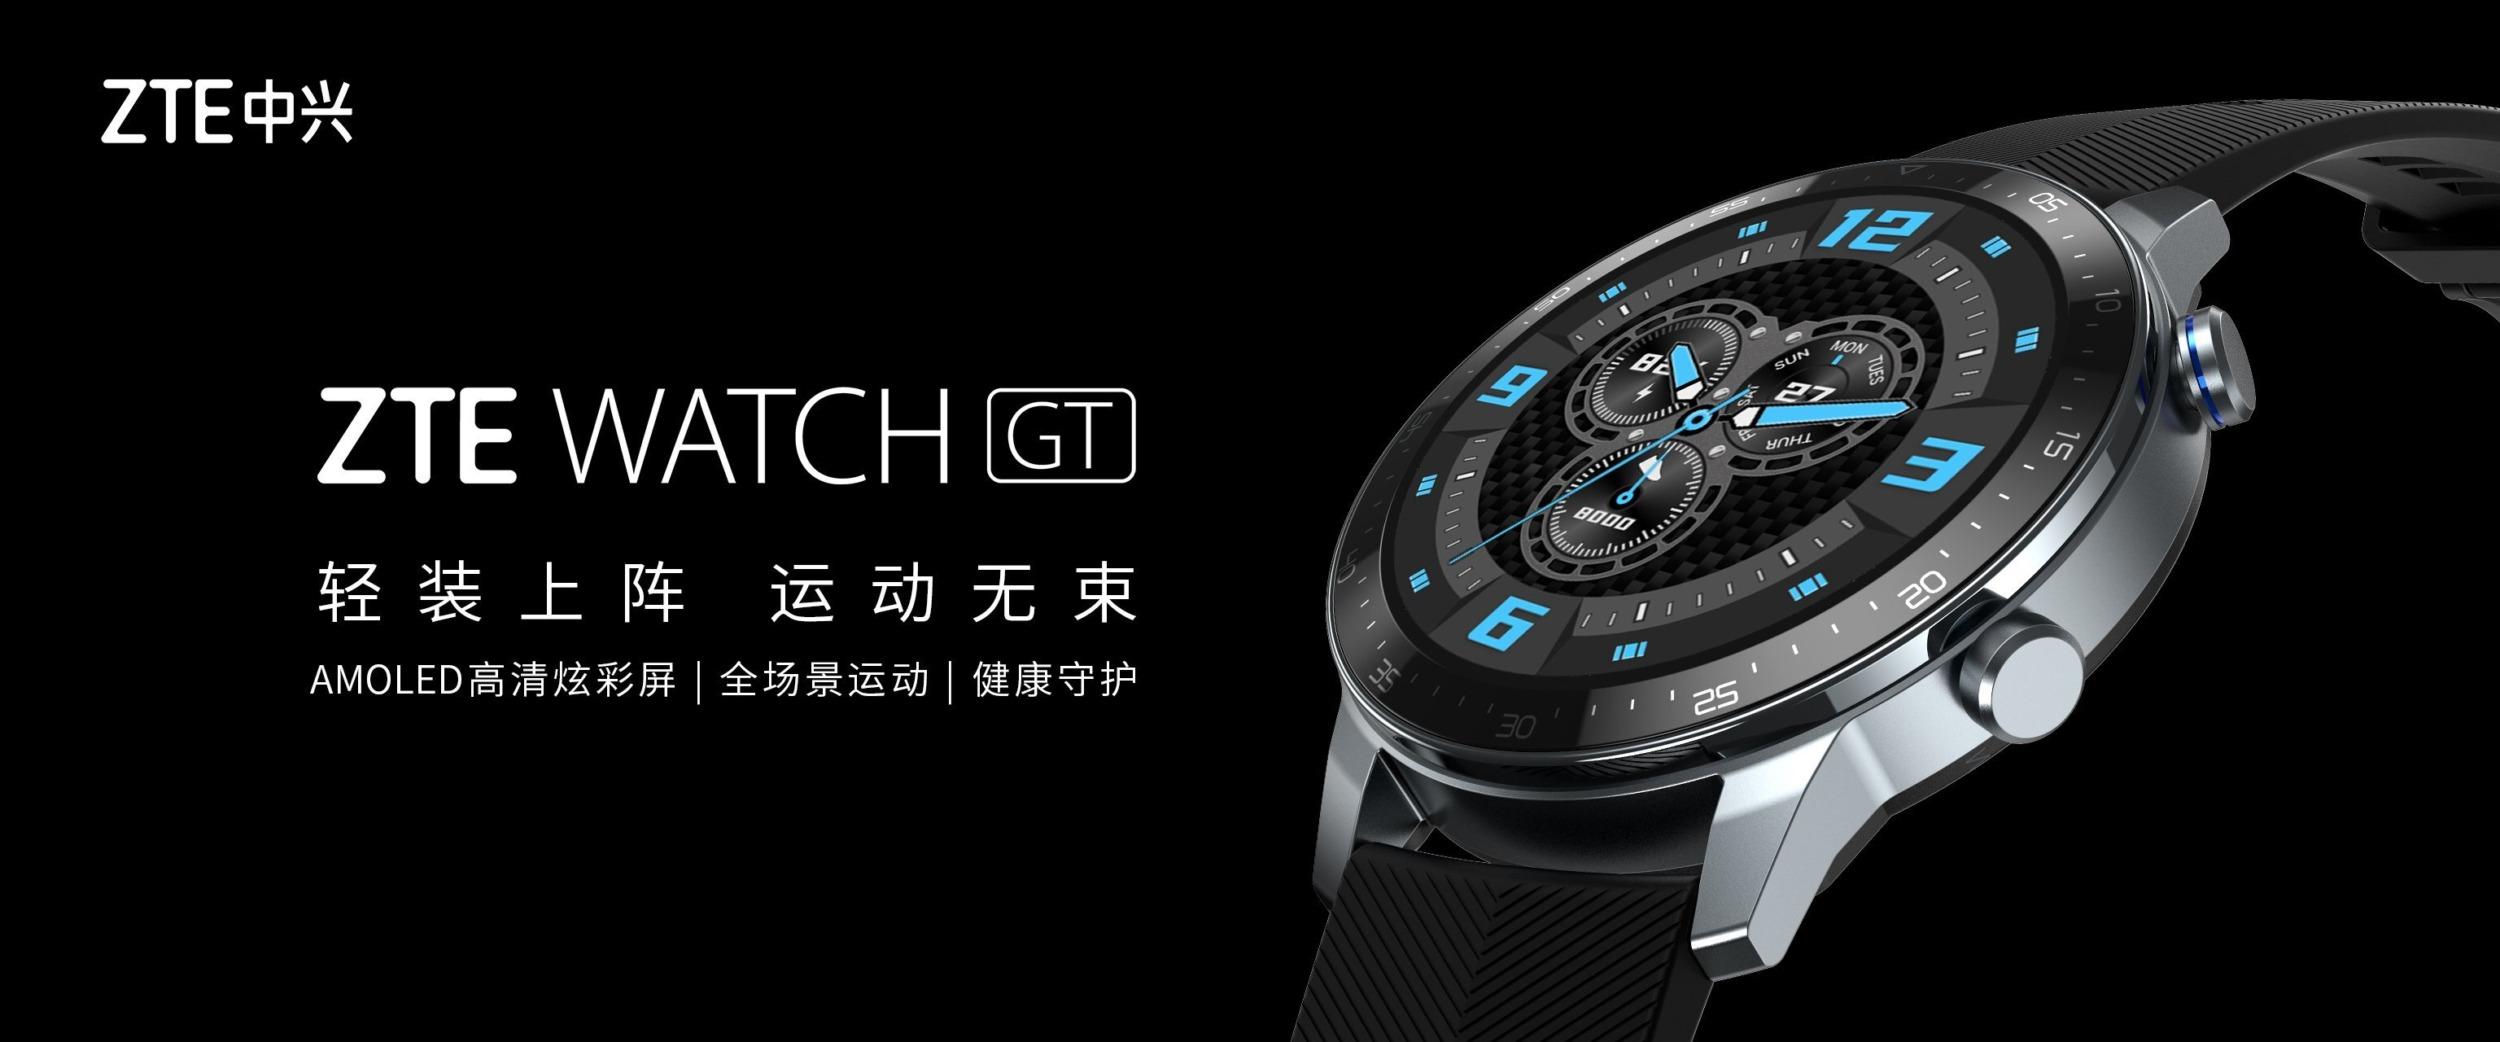 Watch GT 1 3072x1280x